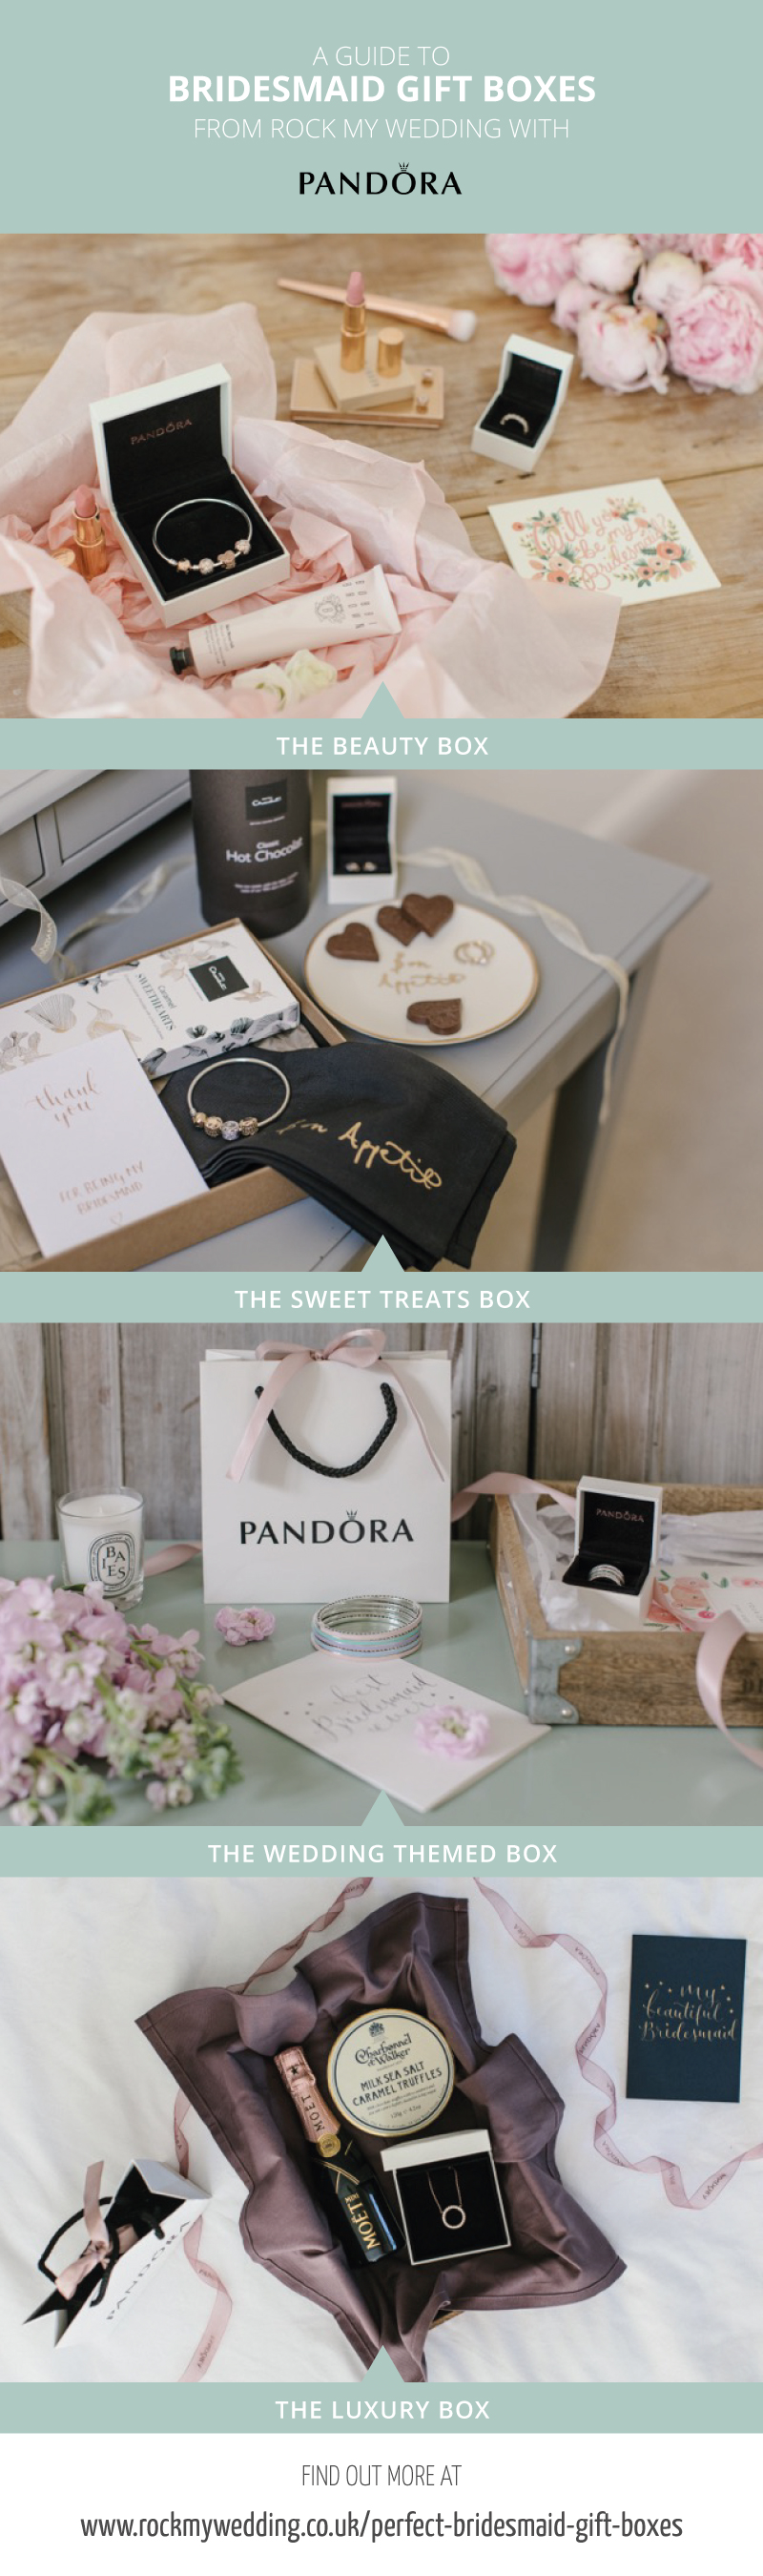 Perfect Bridesmaid Gift Boxes with PANDORA